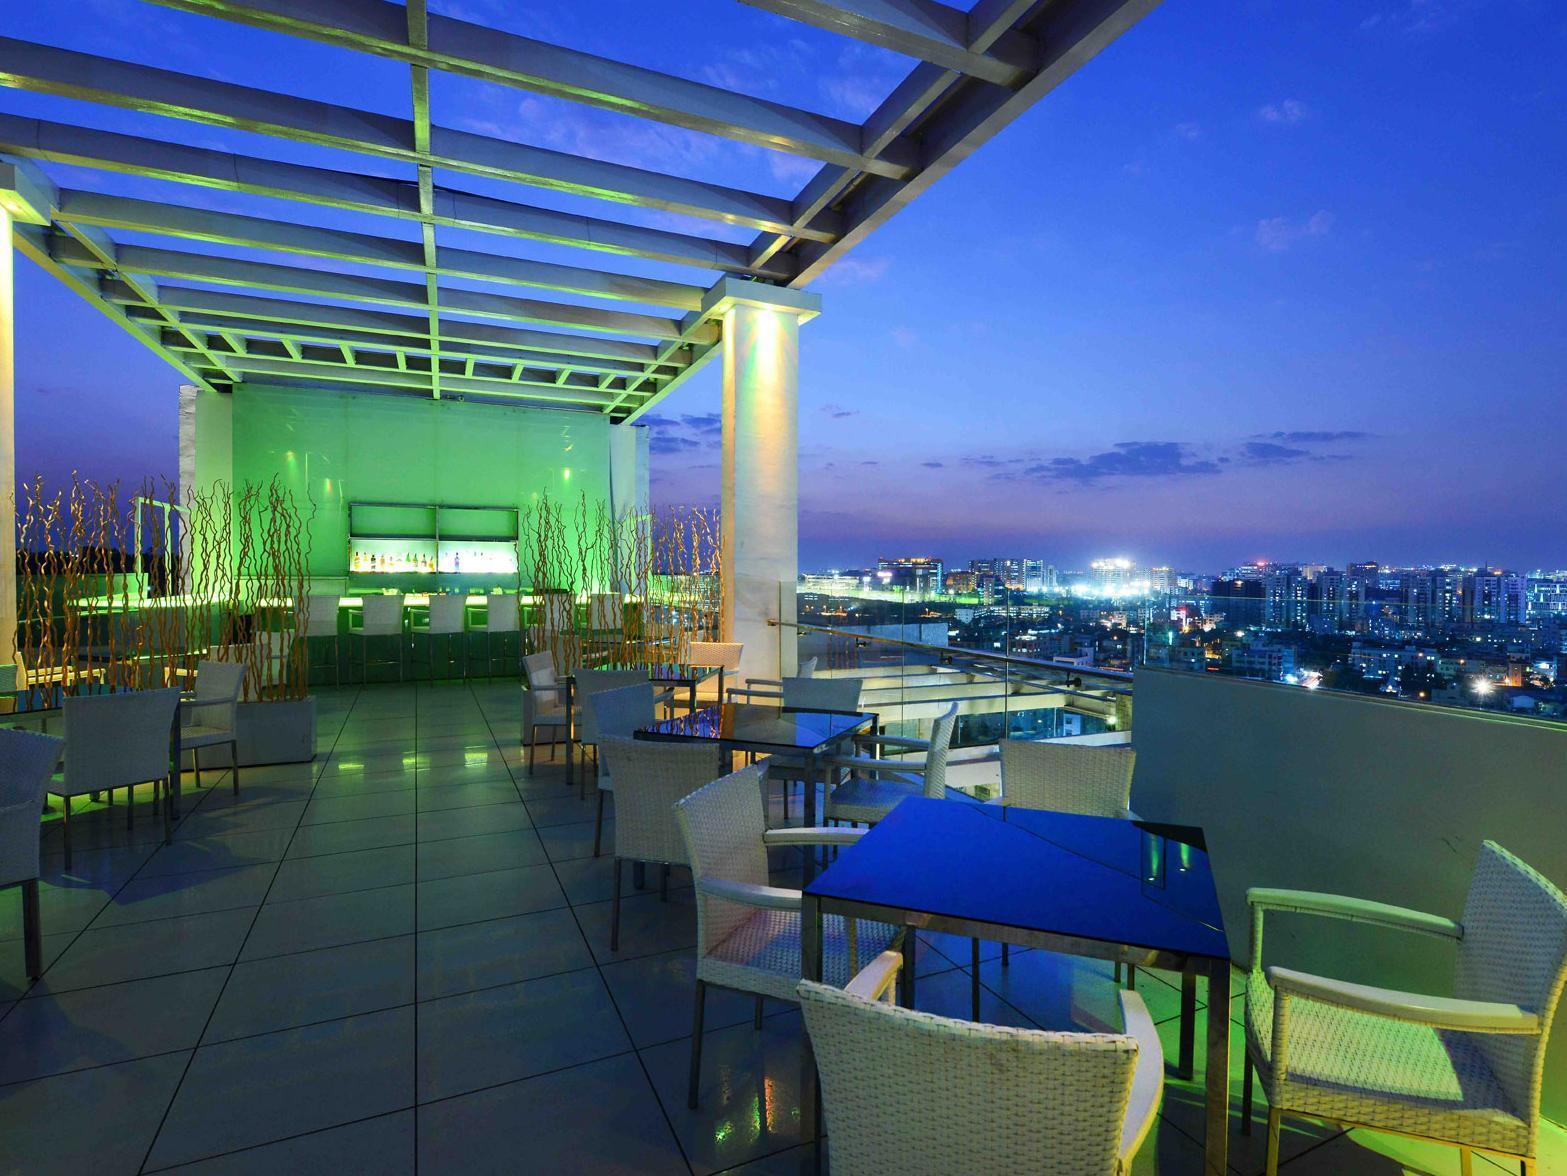 Hotel Daspalla - Hyderabad